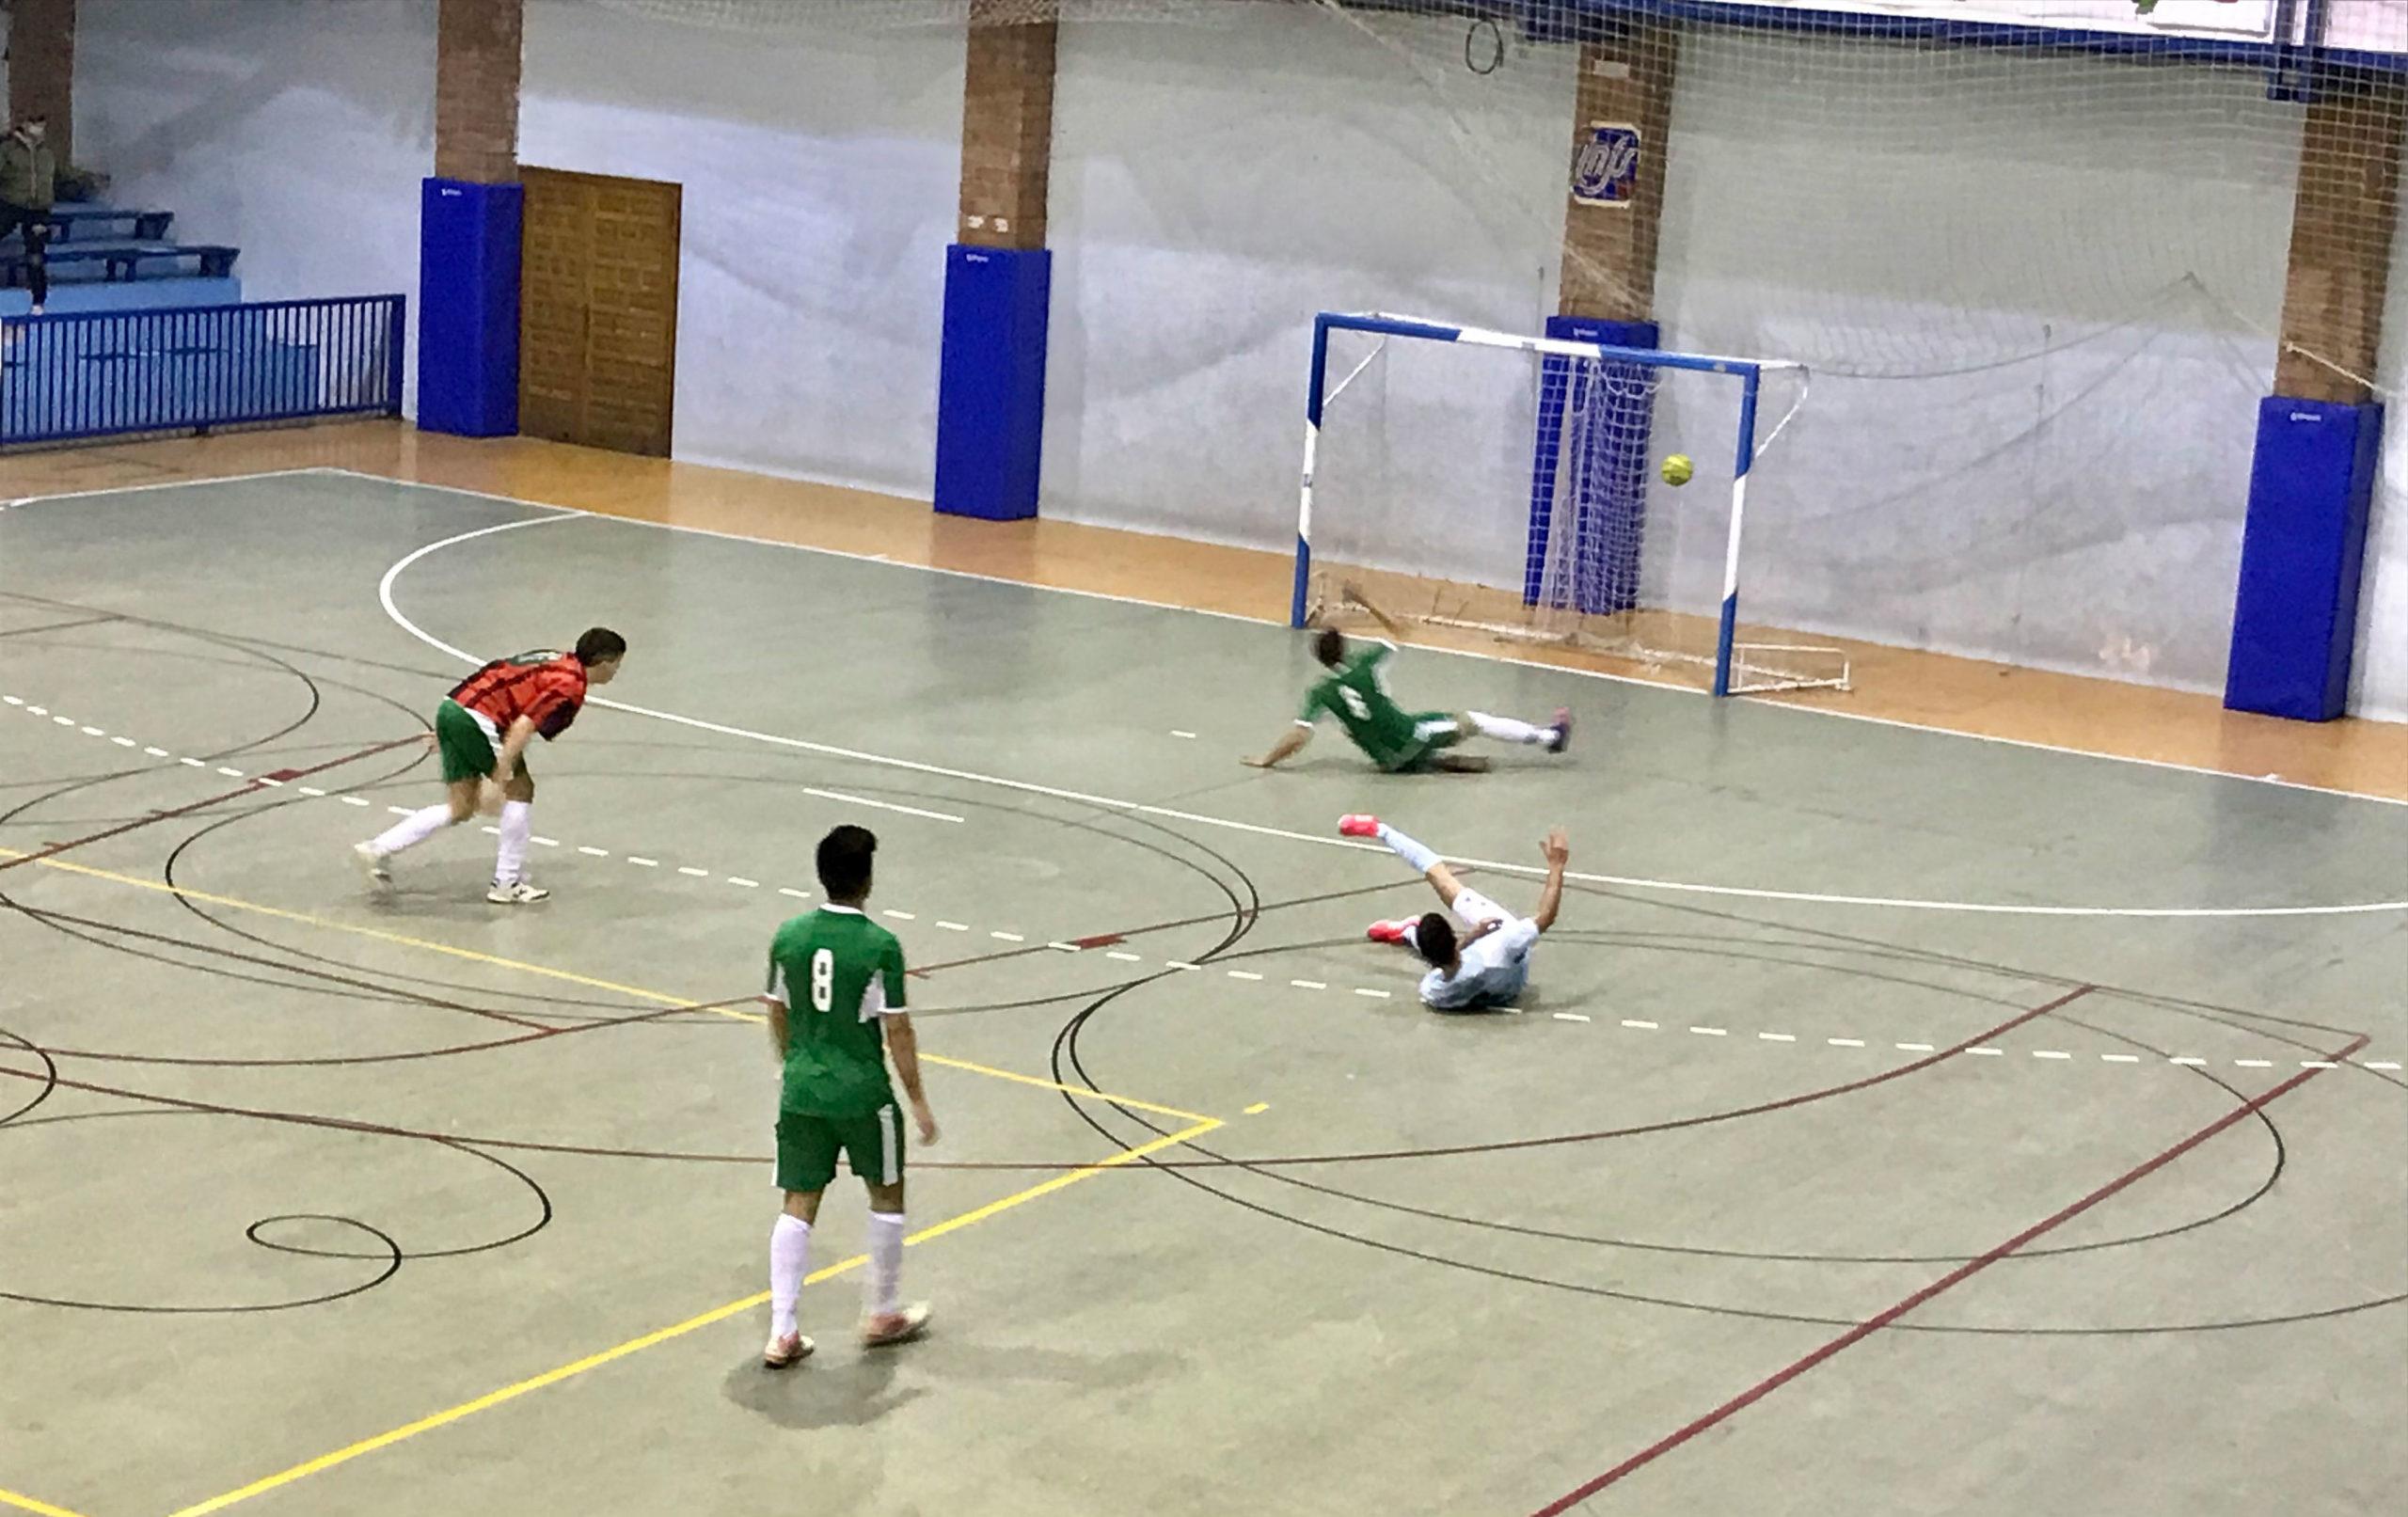 El Caspe mete gol al Alcorisa aprovechando la ausencia de su portero. L.Q.V.